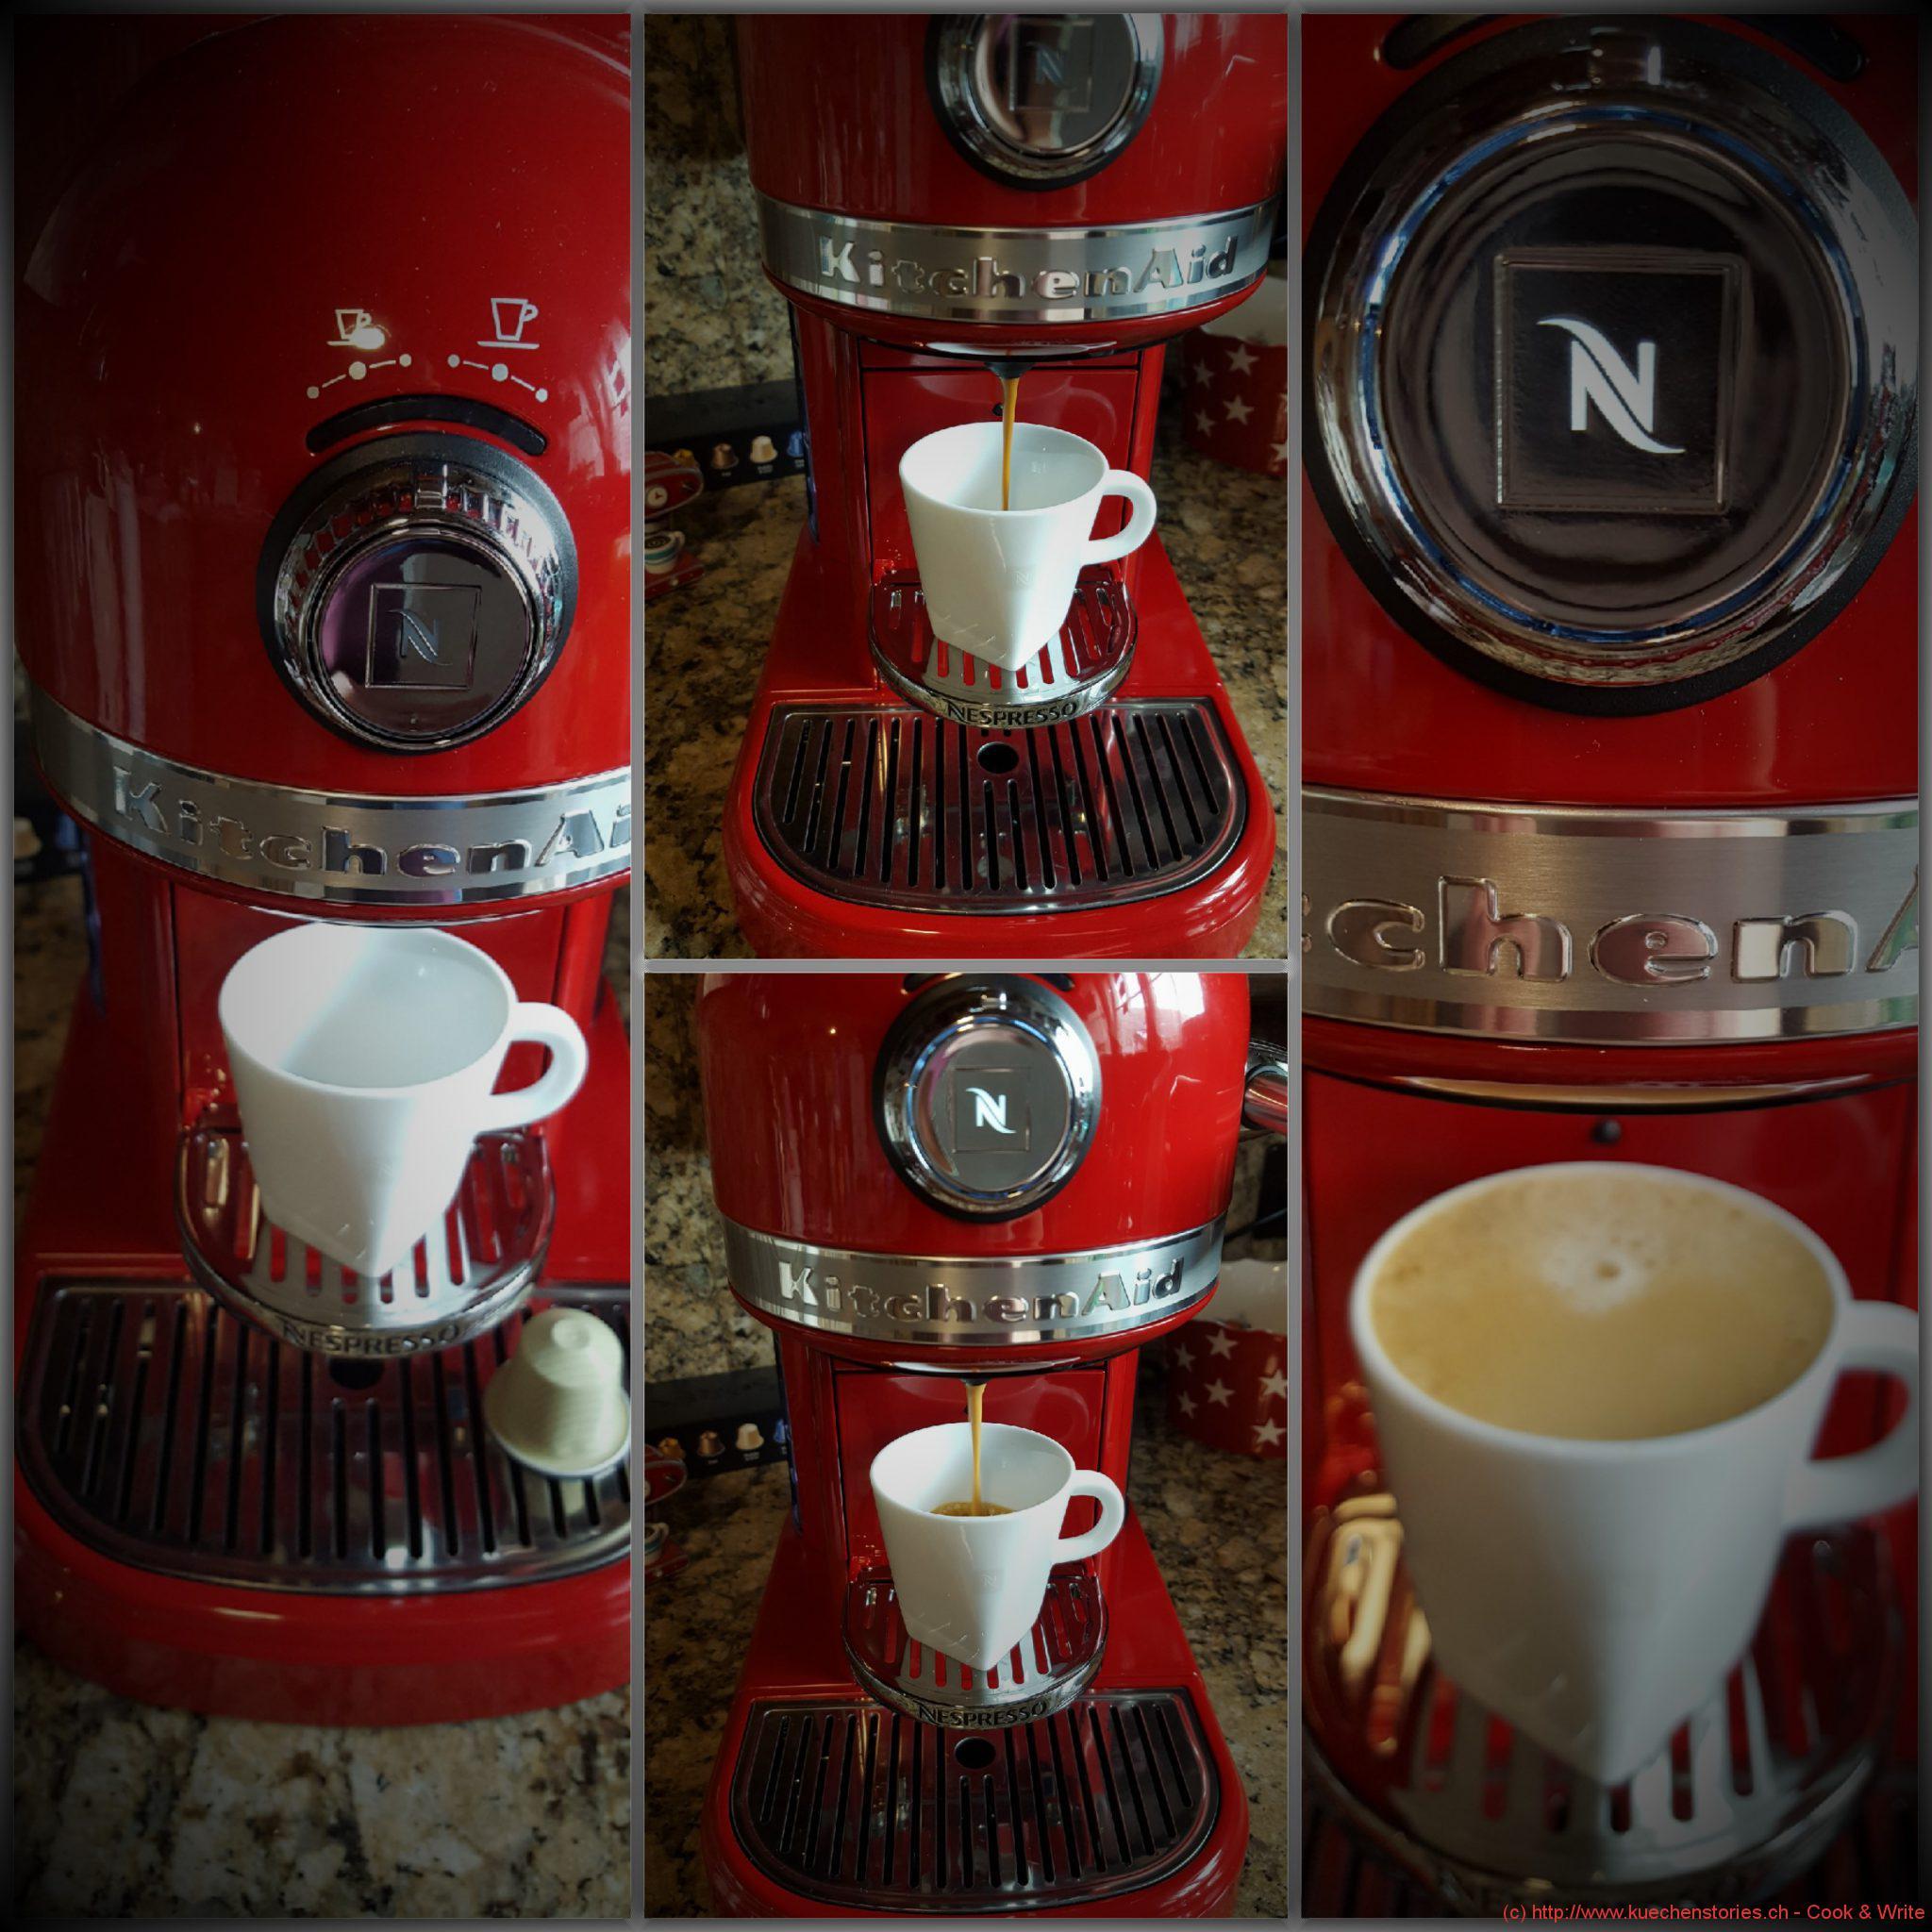 kitchenaid nespresso kaffeemaschine artisan. Black Bedroom Furniture Sets. Home Design Ideas